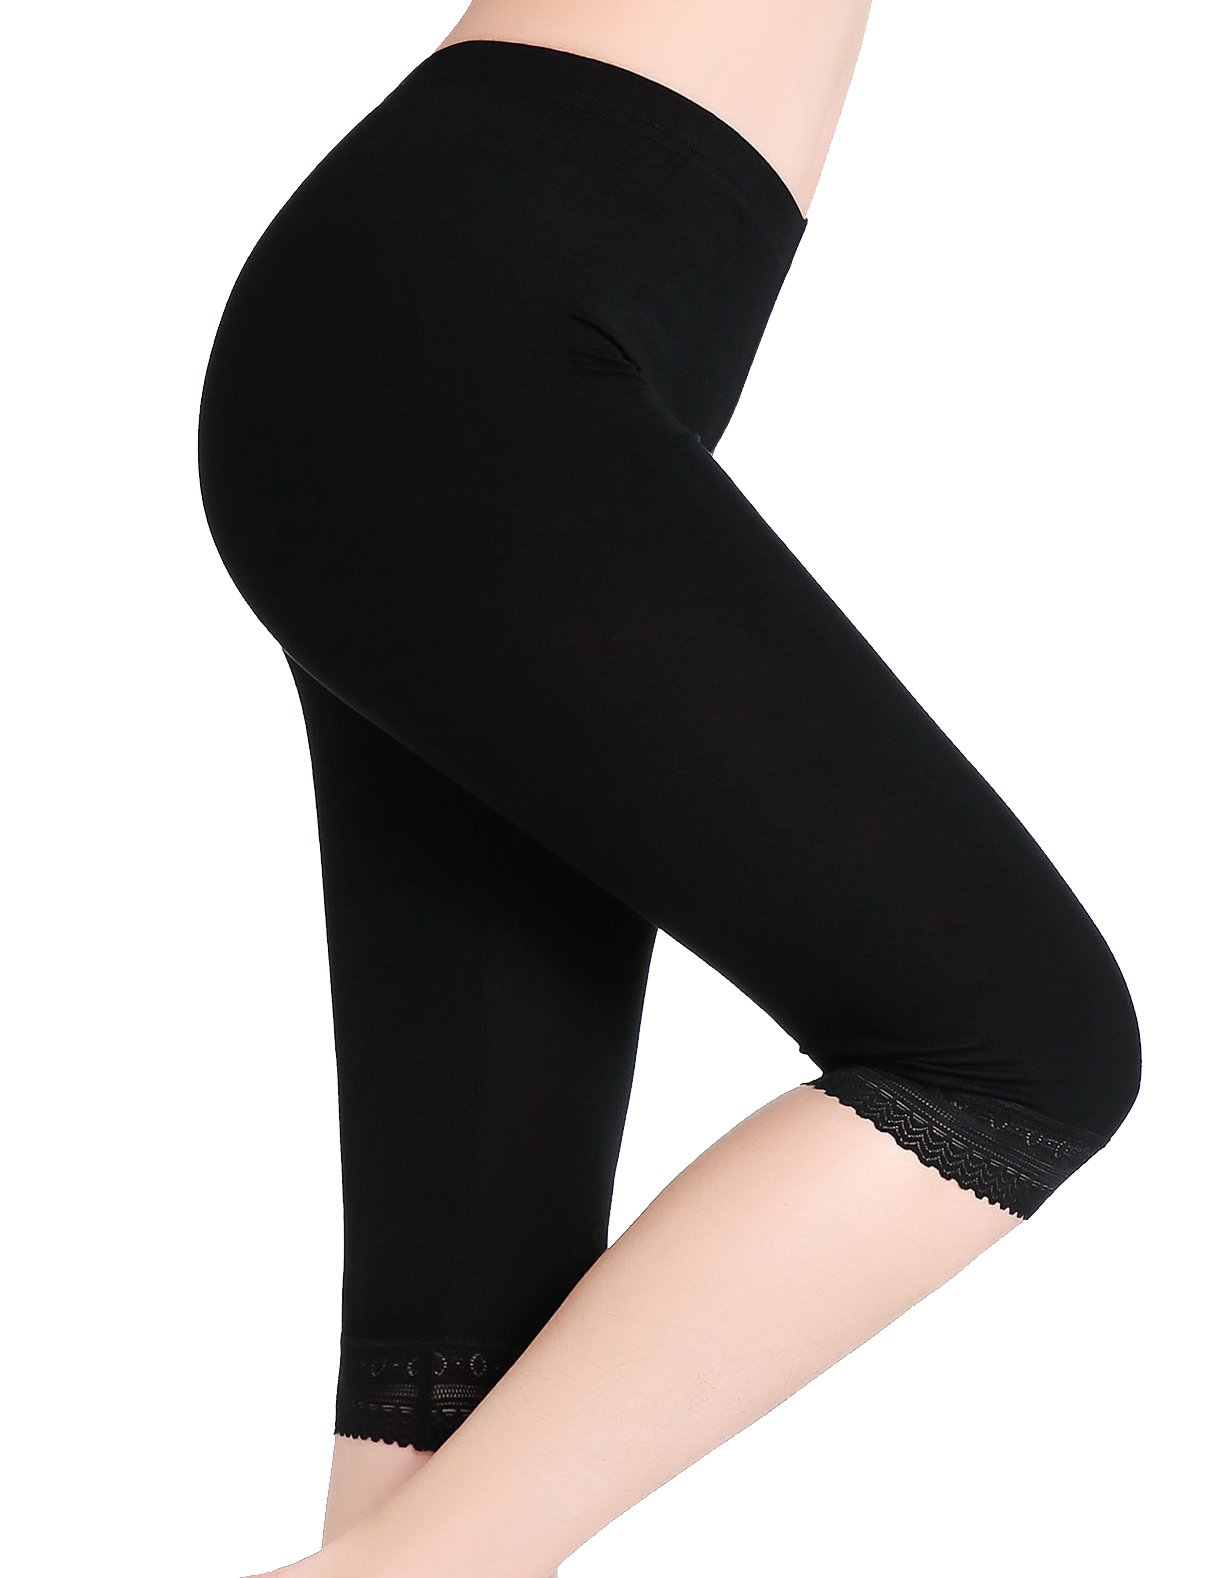 CnlanRow Women's Soft Lace Cropped Leggings Fitness Sport Capris Stretch Short Leggings,Black Lace Trim,3X Big